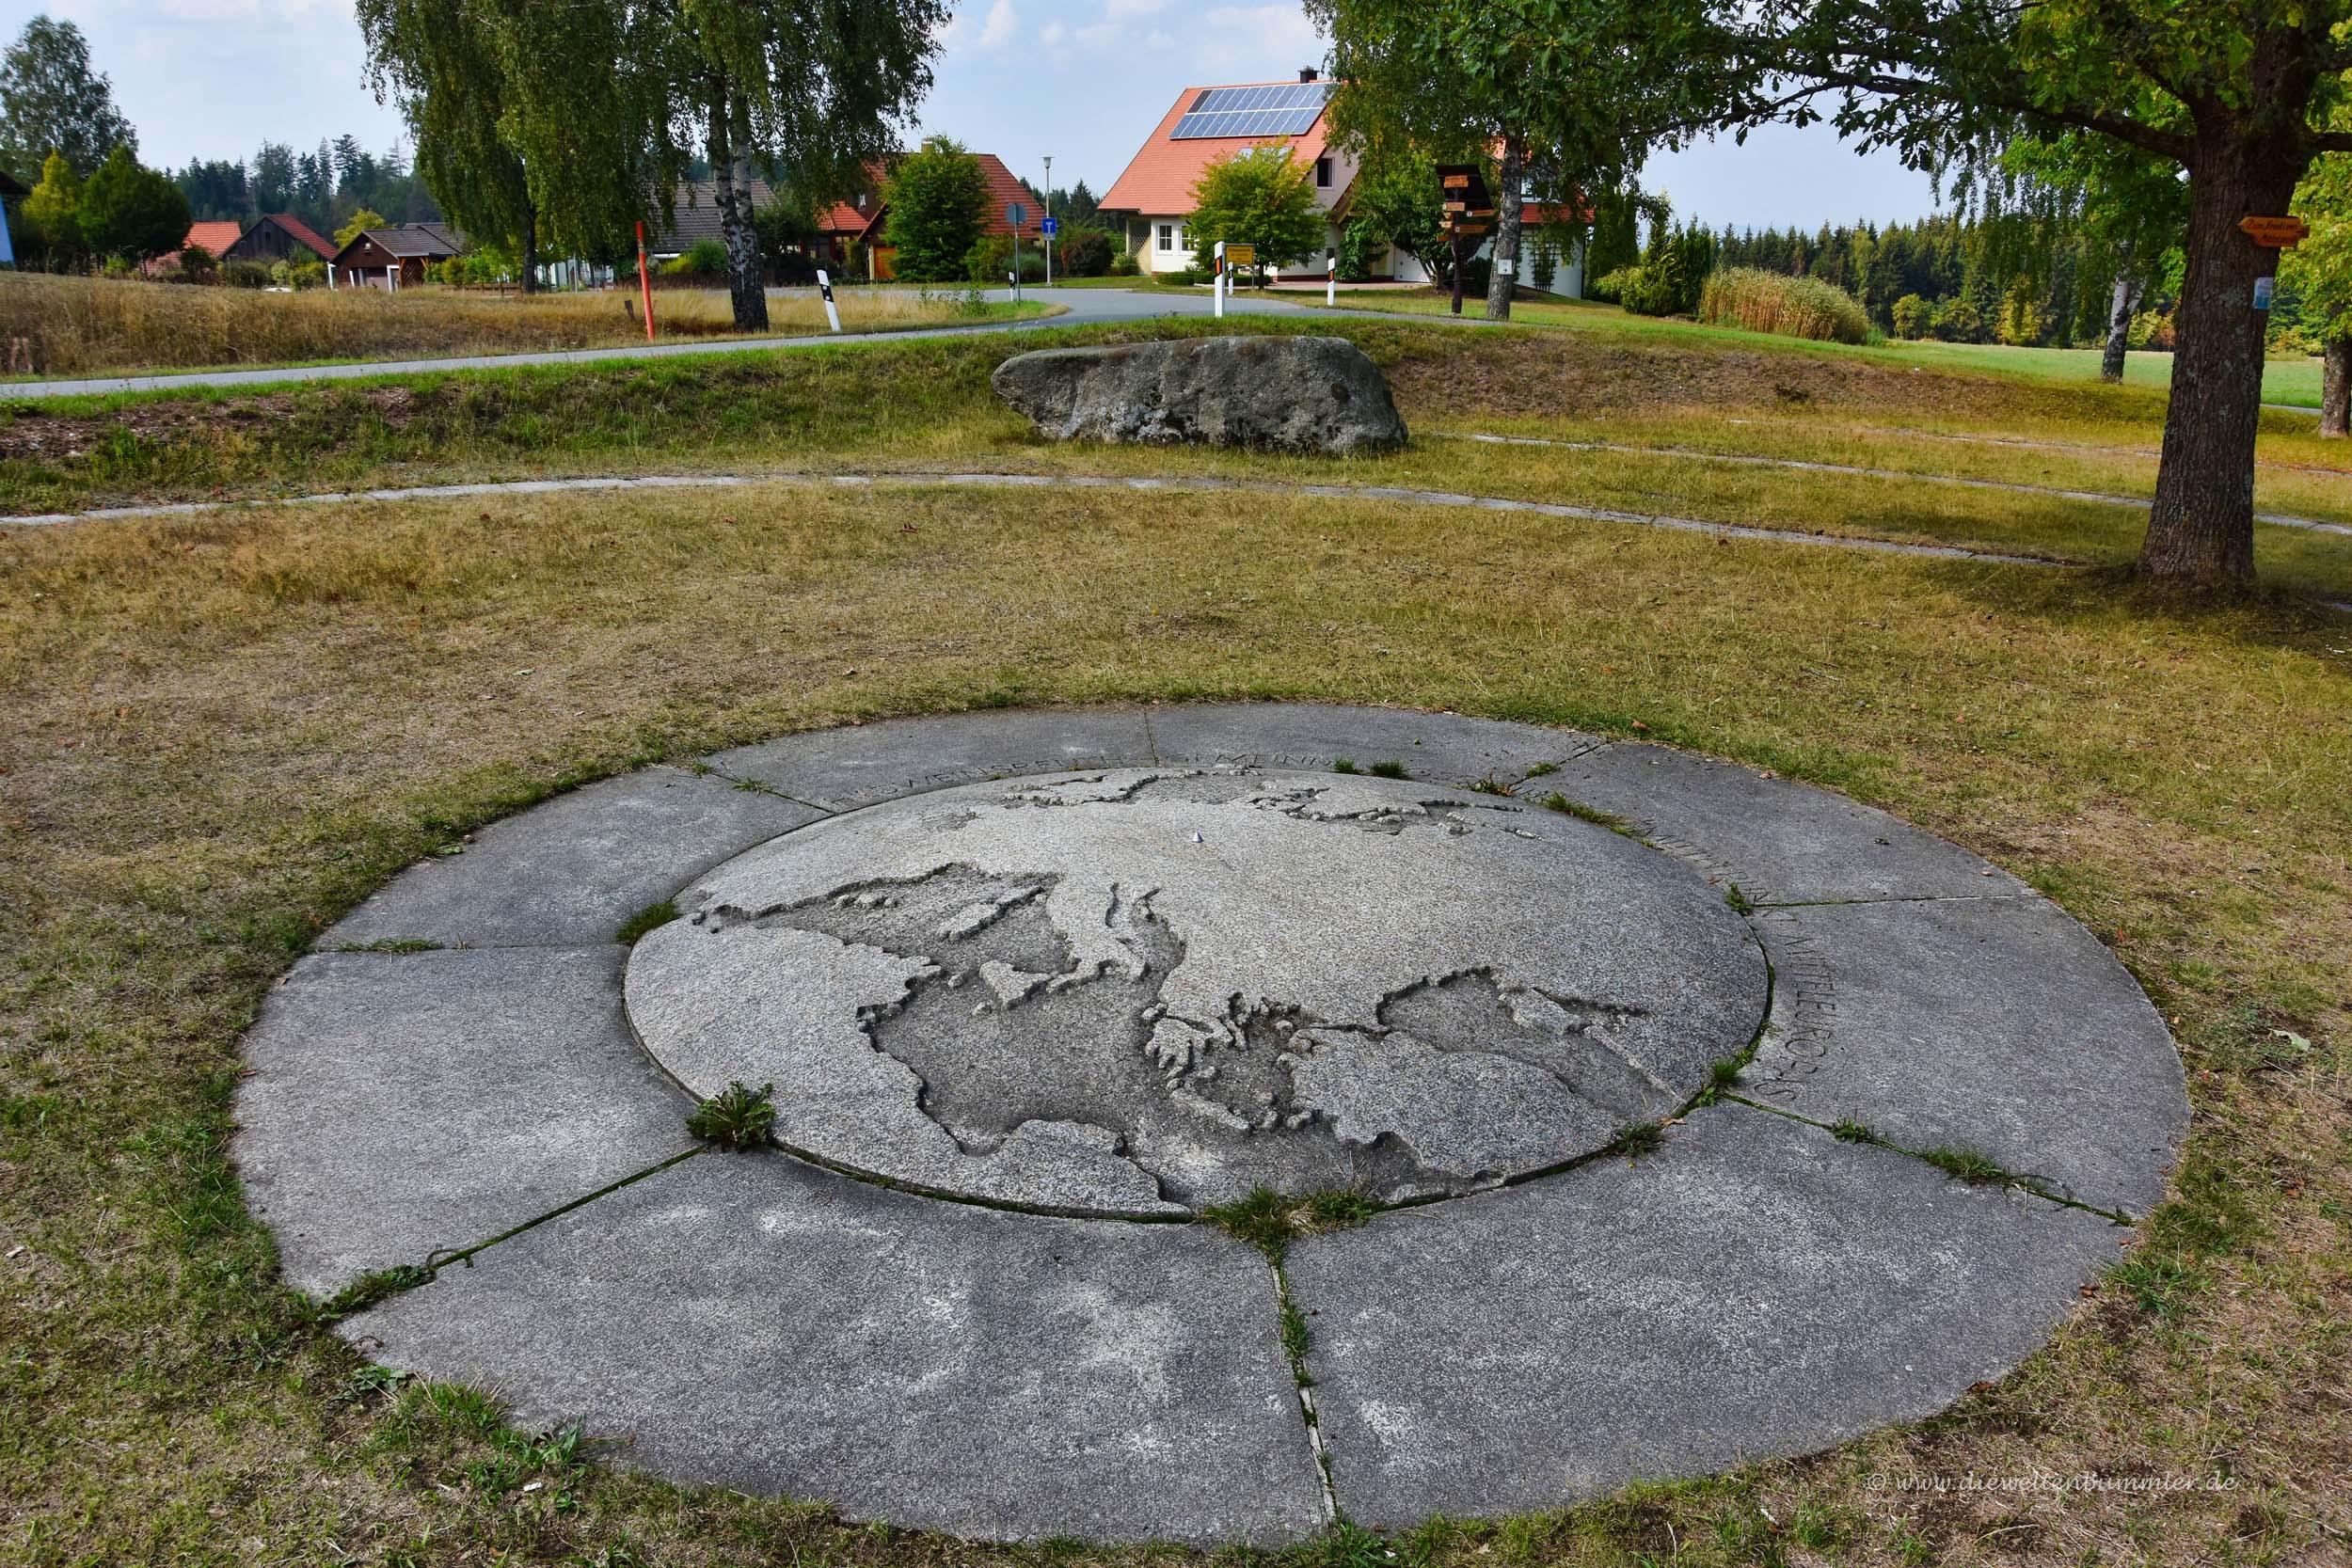 Mitteleuropas Mittelpunkt